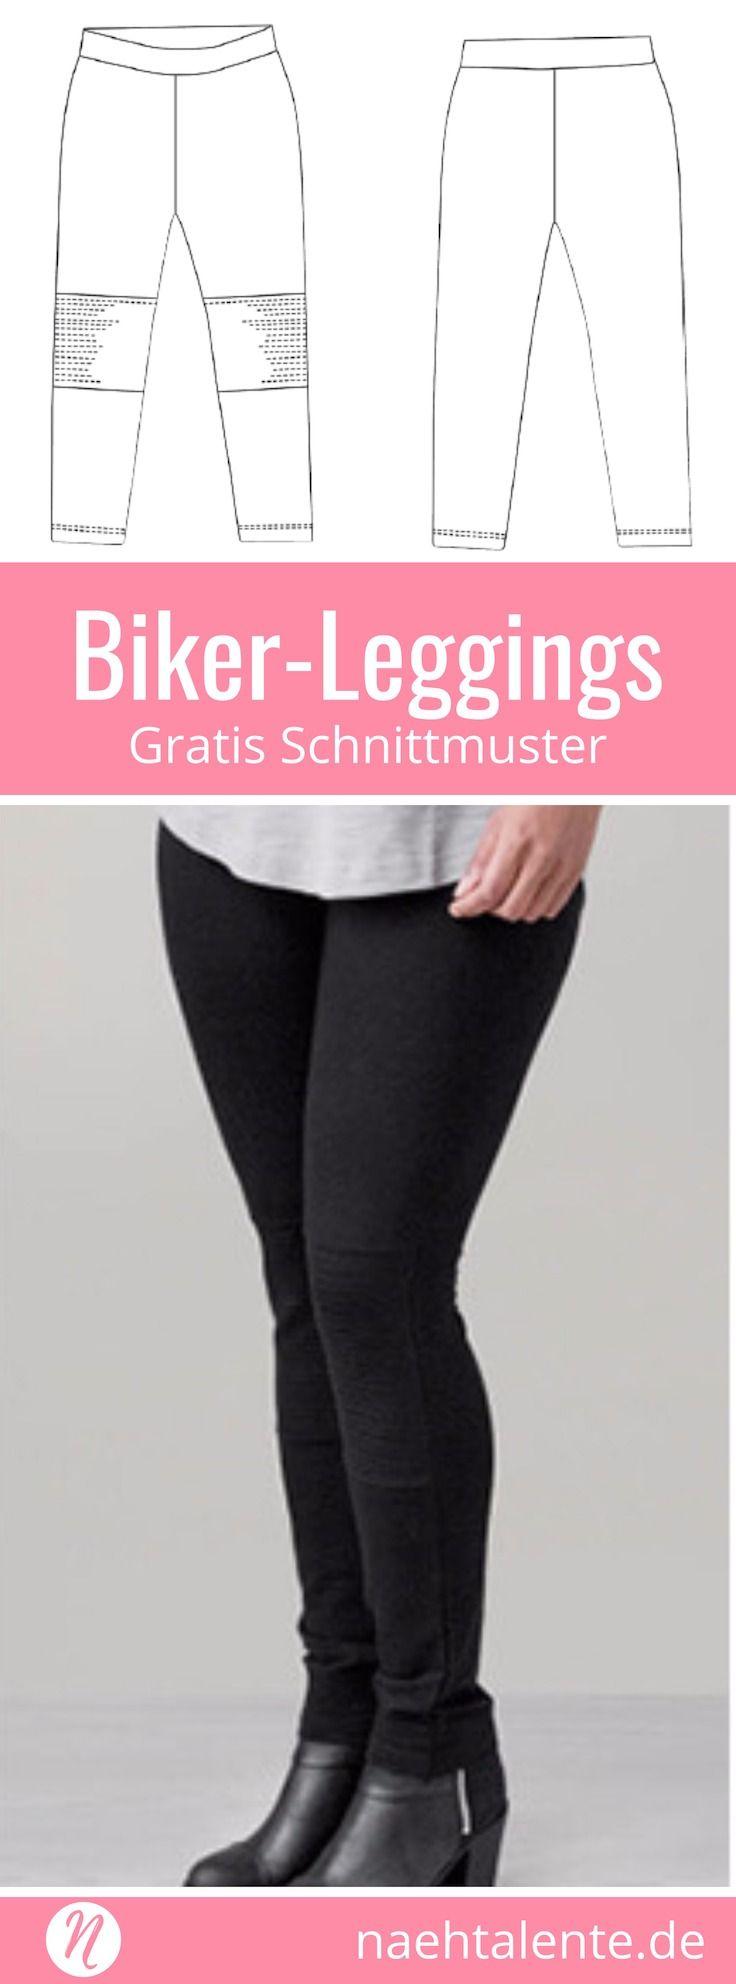 Damen-Leggings im Biker Stil – Freebook Tipp Gr. XS – XL – Nina